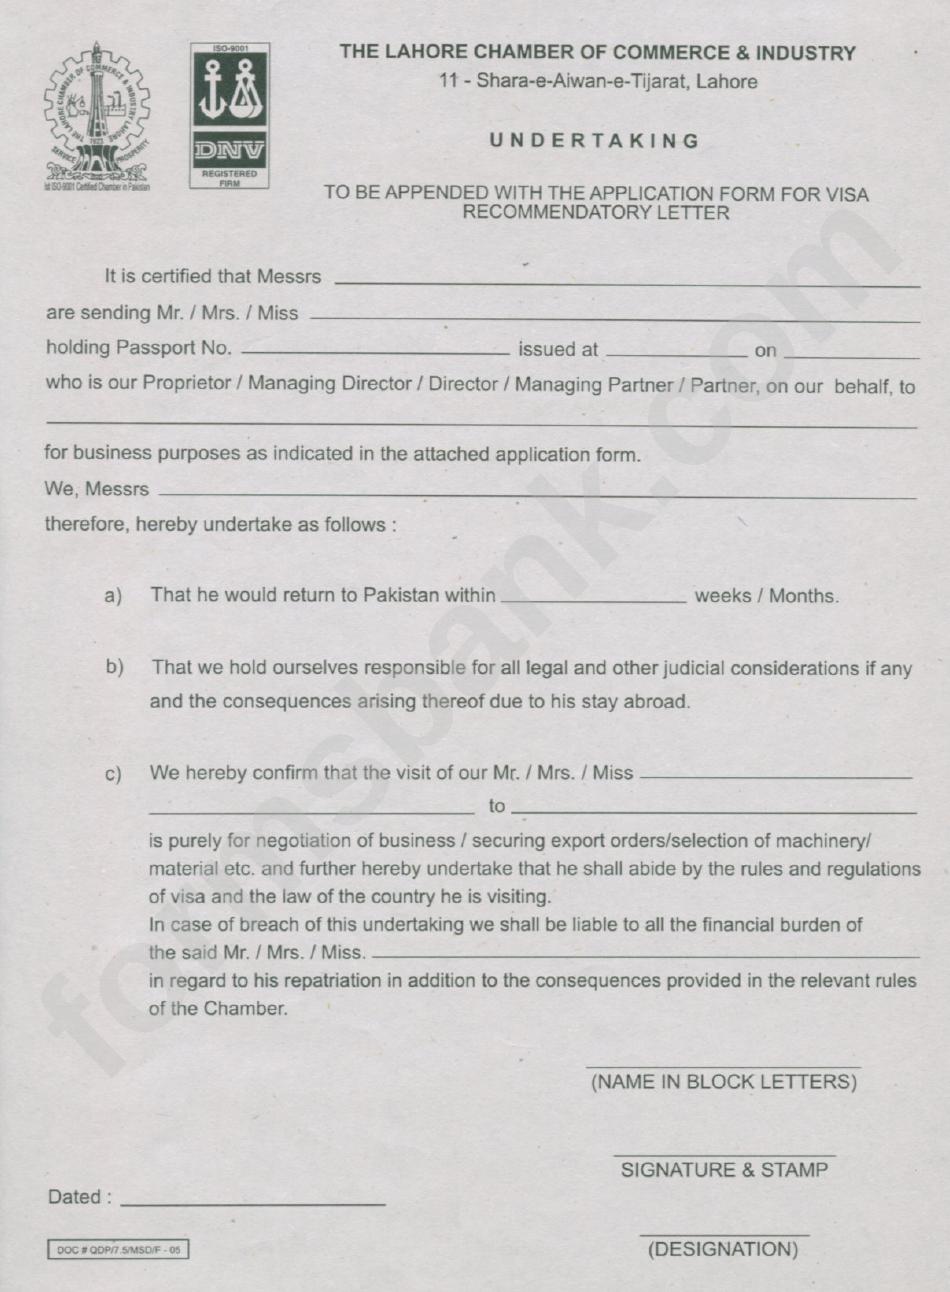 Application For Visa Recommendation Letter